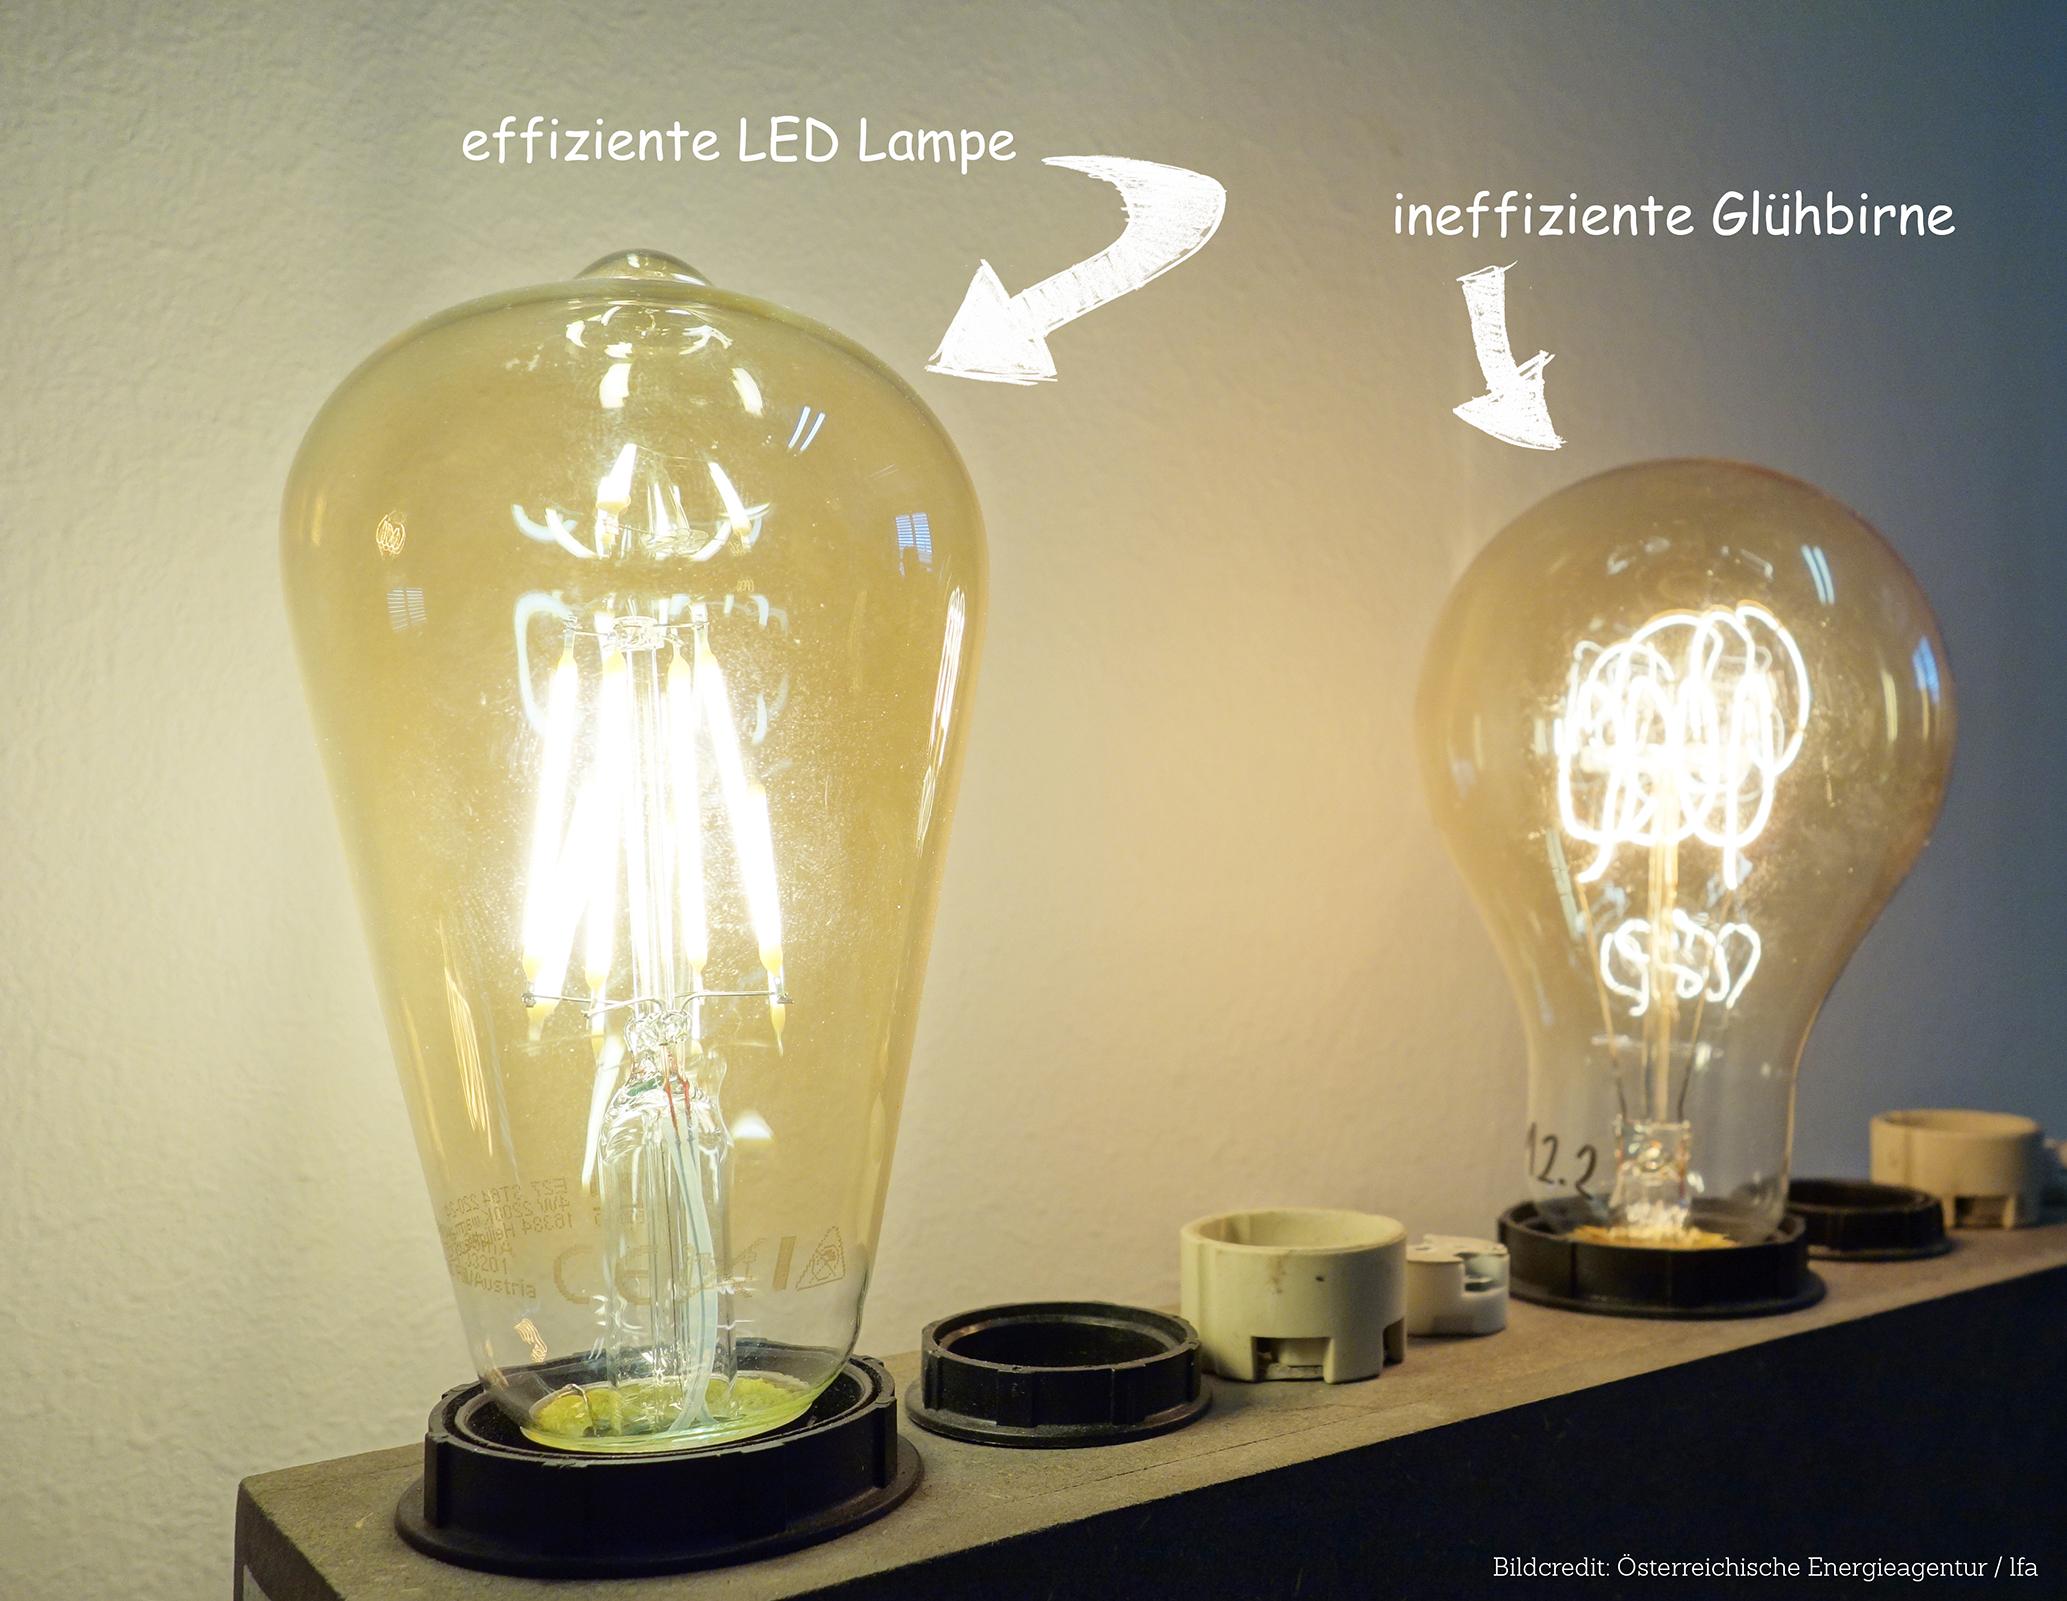 Moderne Lampen 16 : Leds vs. dekoglühlampen Ökologie essays im austria forum